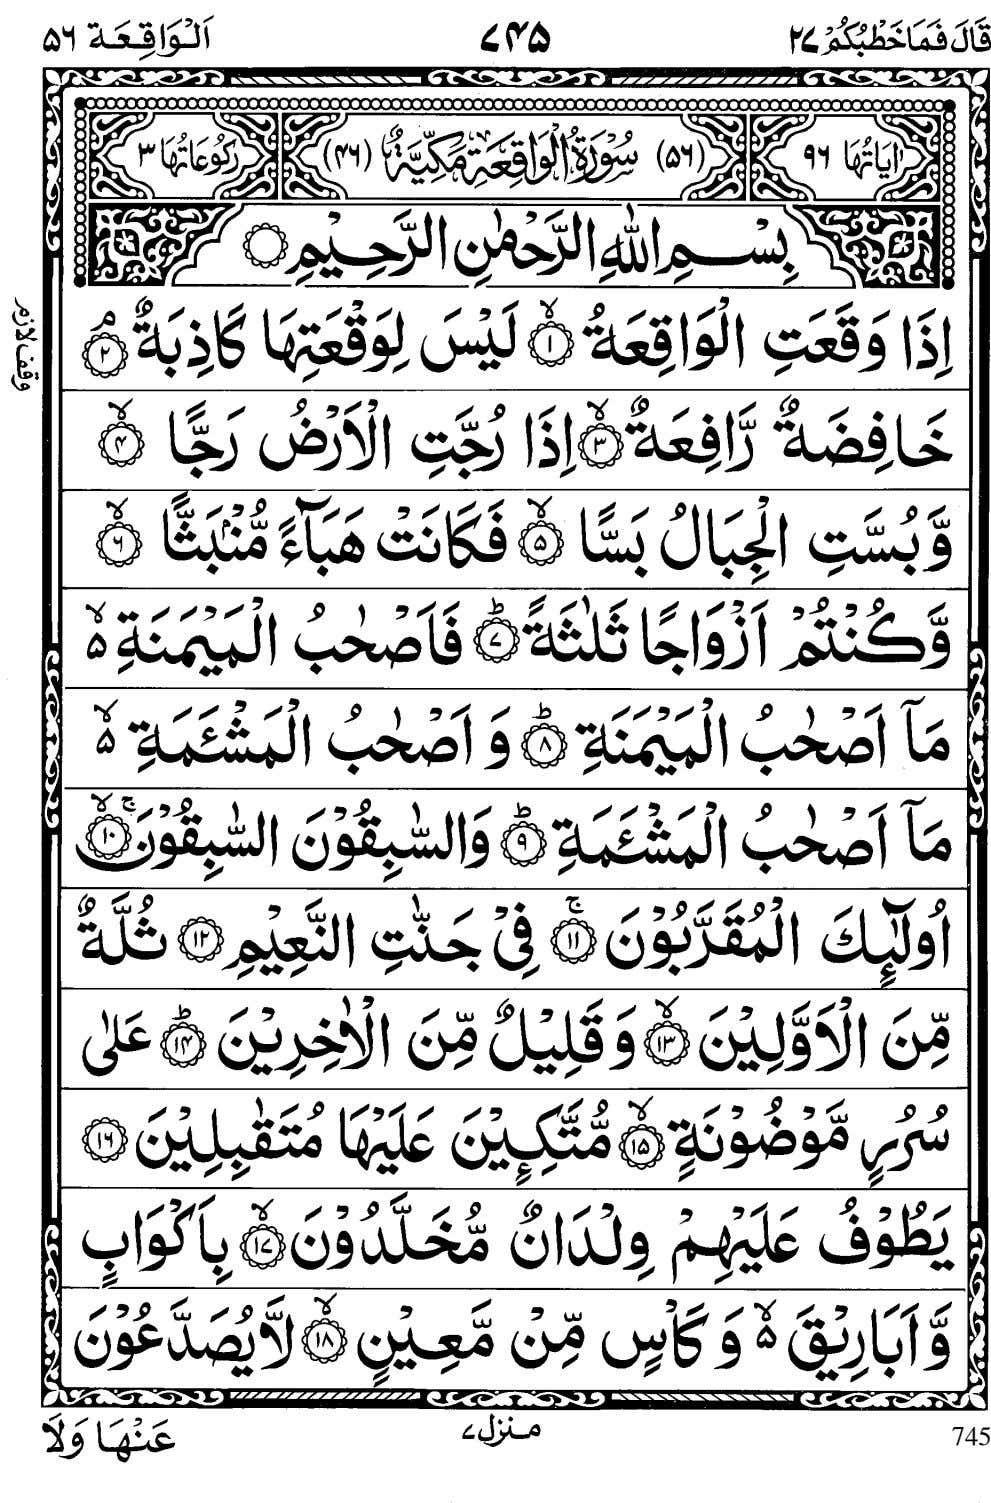 Pin By Khalil Ka On Quran Verses Quran Book Quran Verses Quran Wallpaper